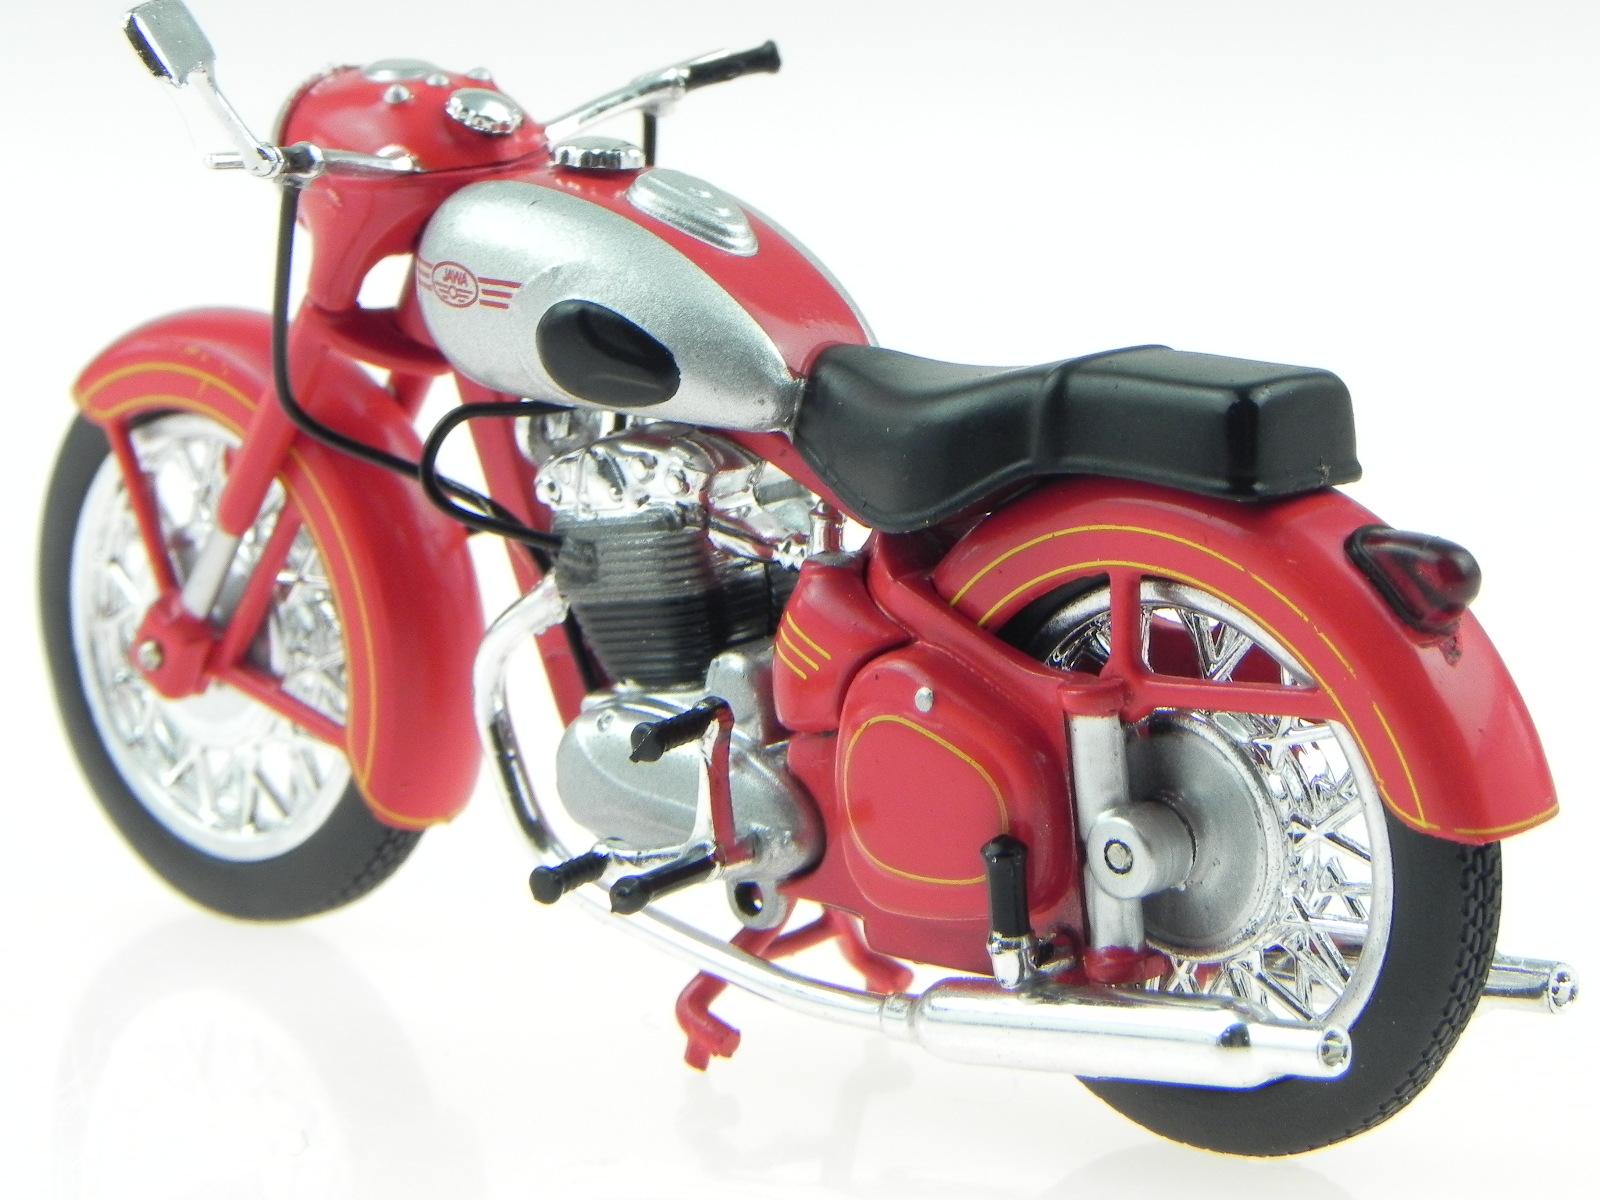 jawa 500 ddr ostalgie motorrad modell atlas 1 24 ebay. Black Bedroom Furniture Sets. Home Design Ideas